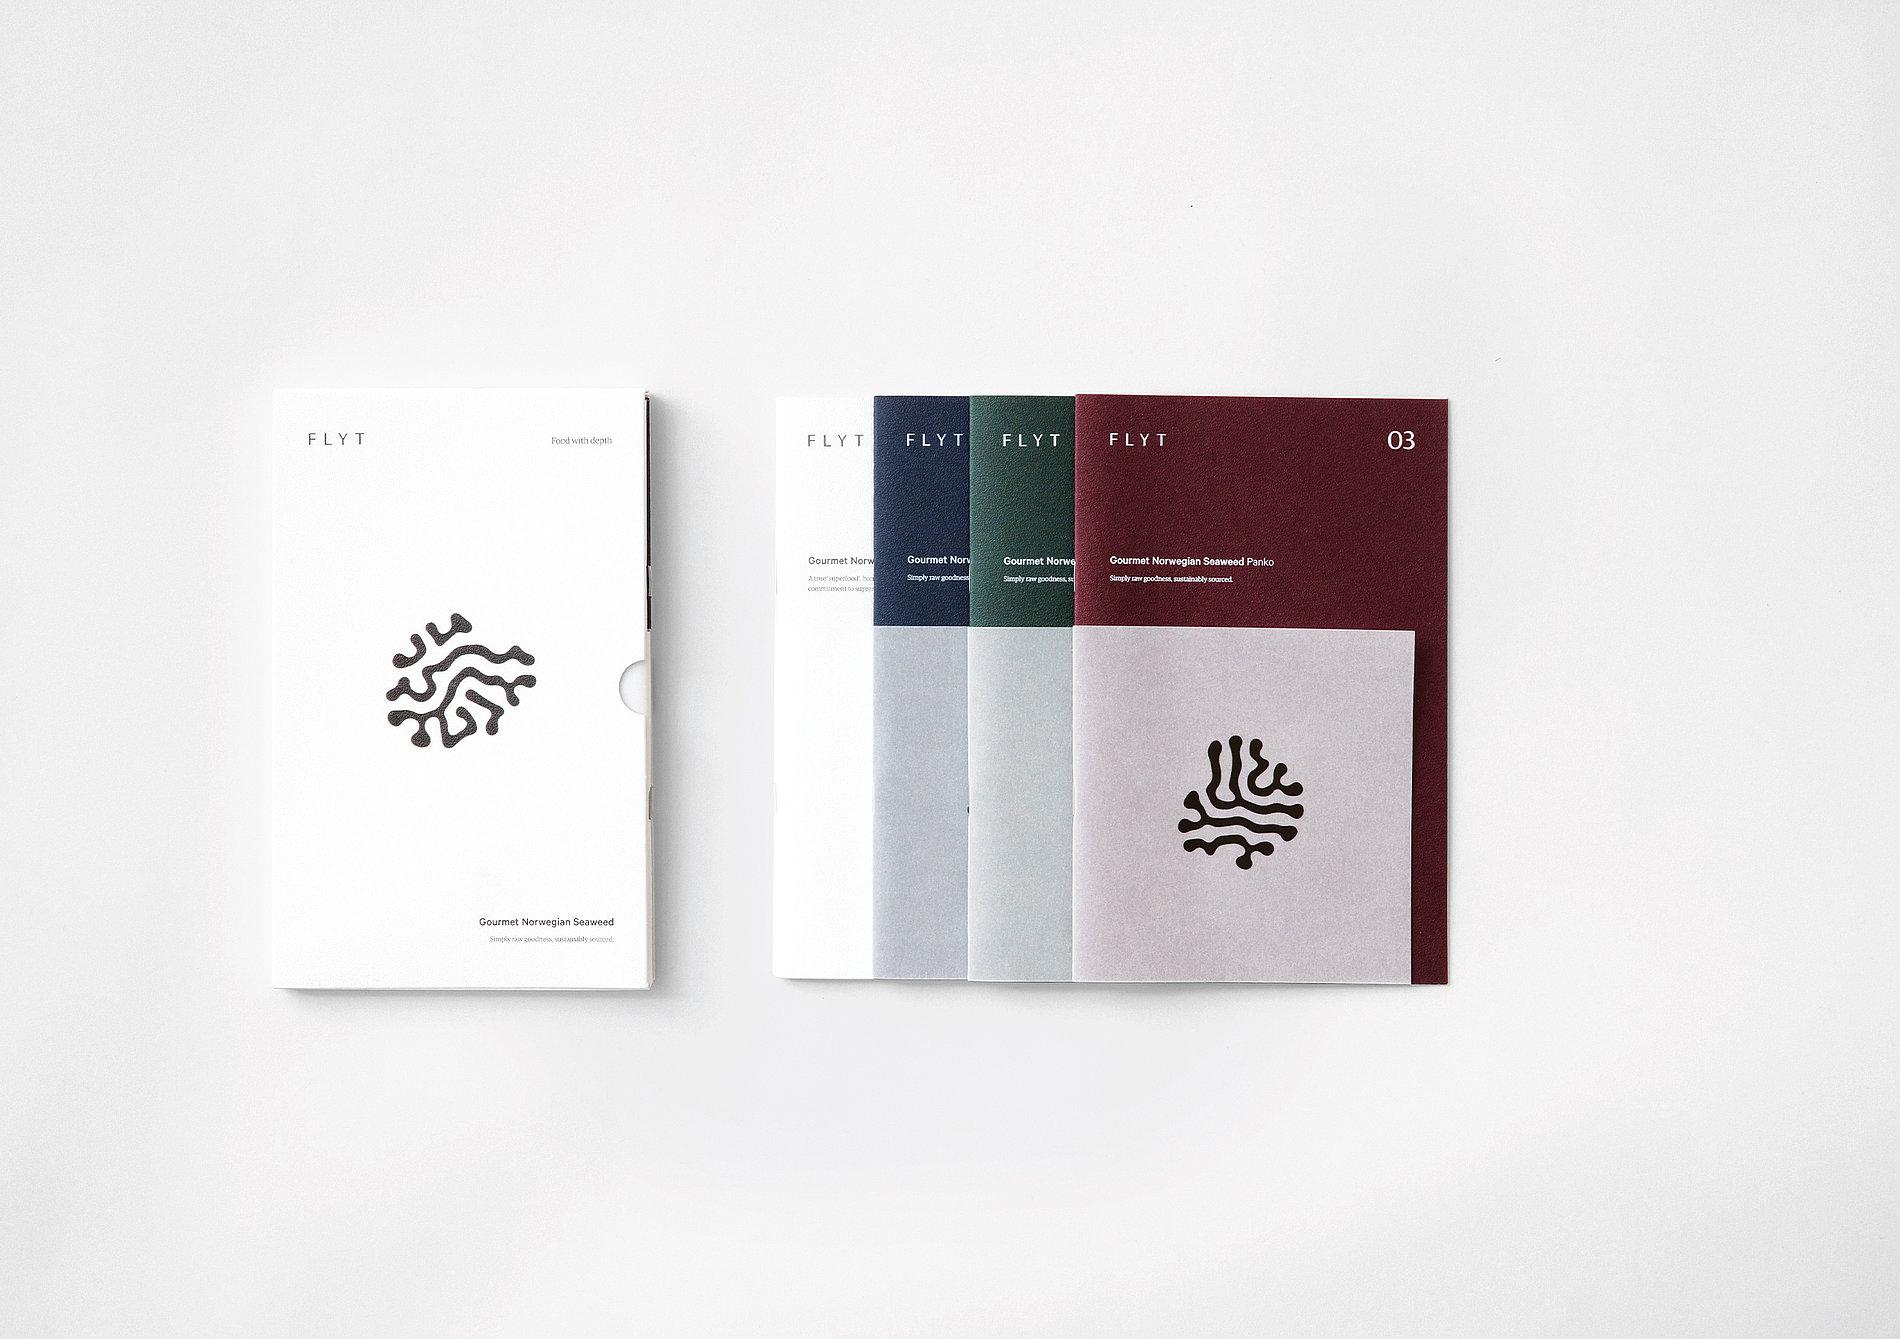 Flyt Seaweed | Red Dot Design Award